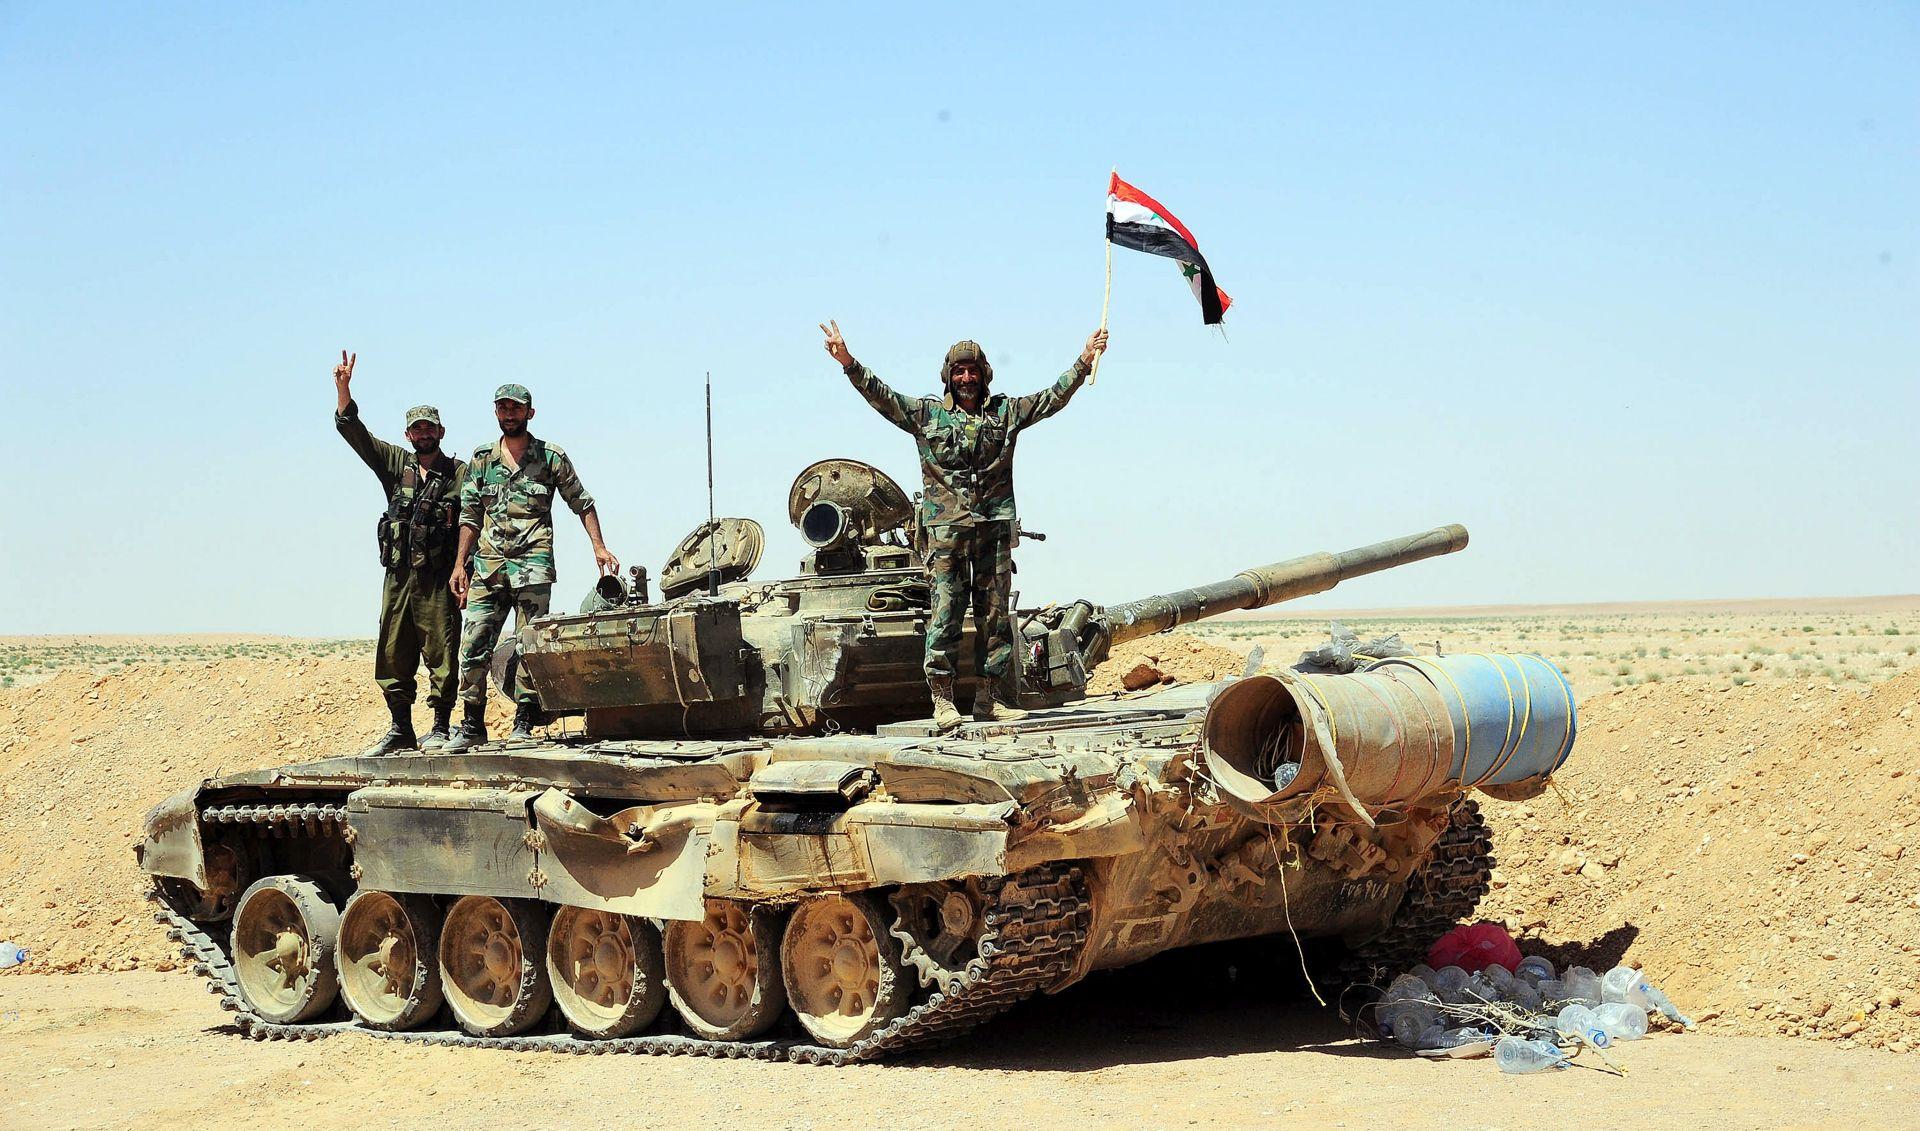 Sirijska vojska objavila primirje, a UN i Rusija planove o novim mirovnim pregovorima